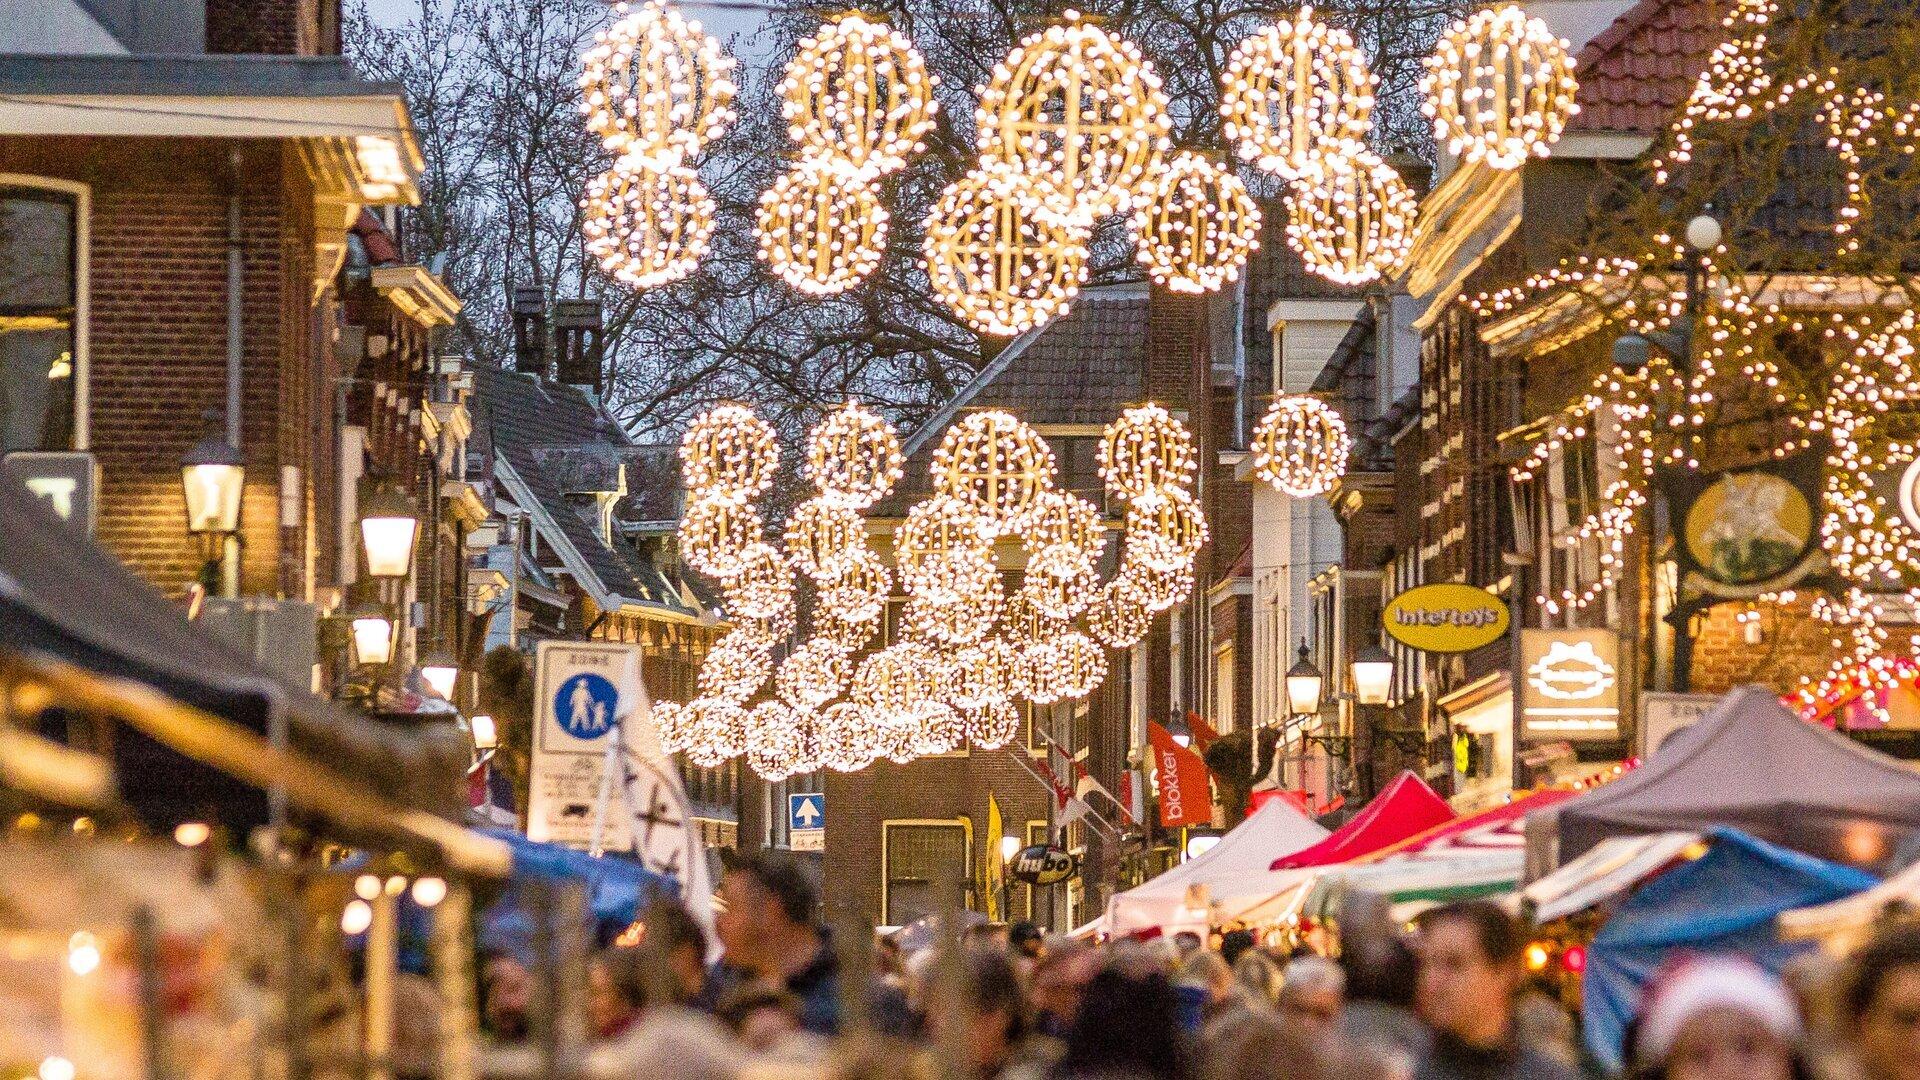 kerstmarkt-2018-highres-4349.jpg